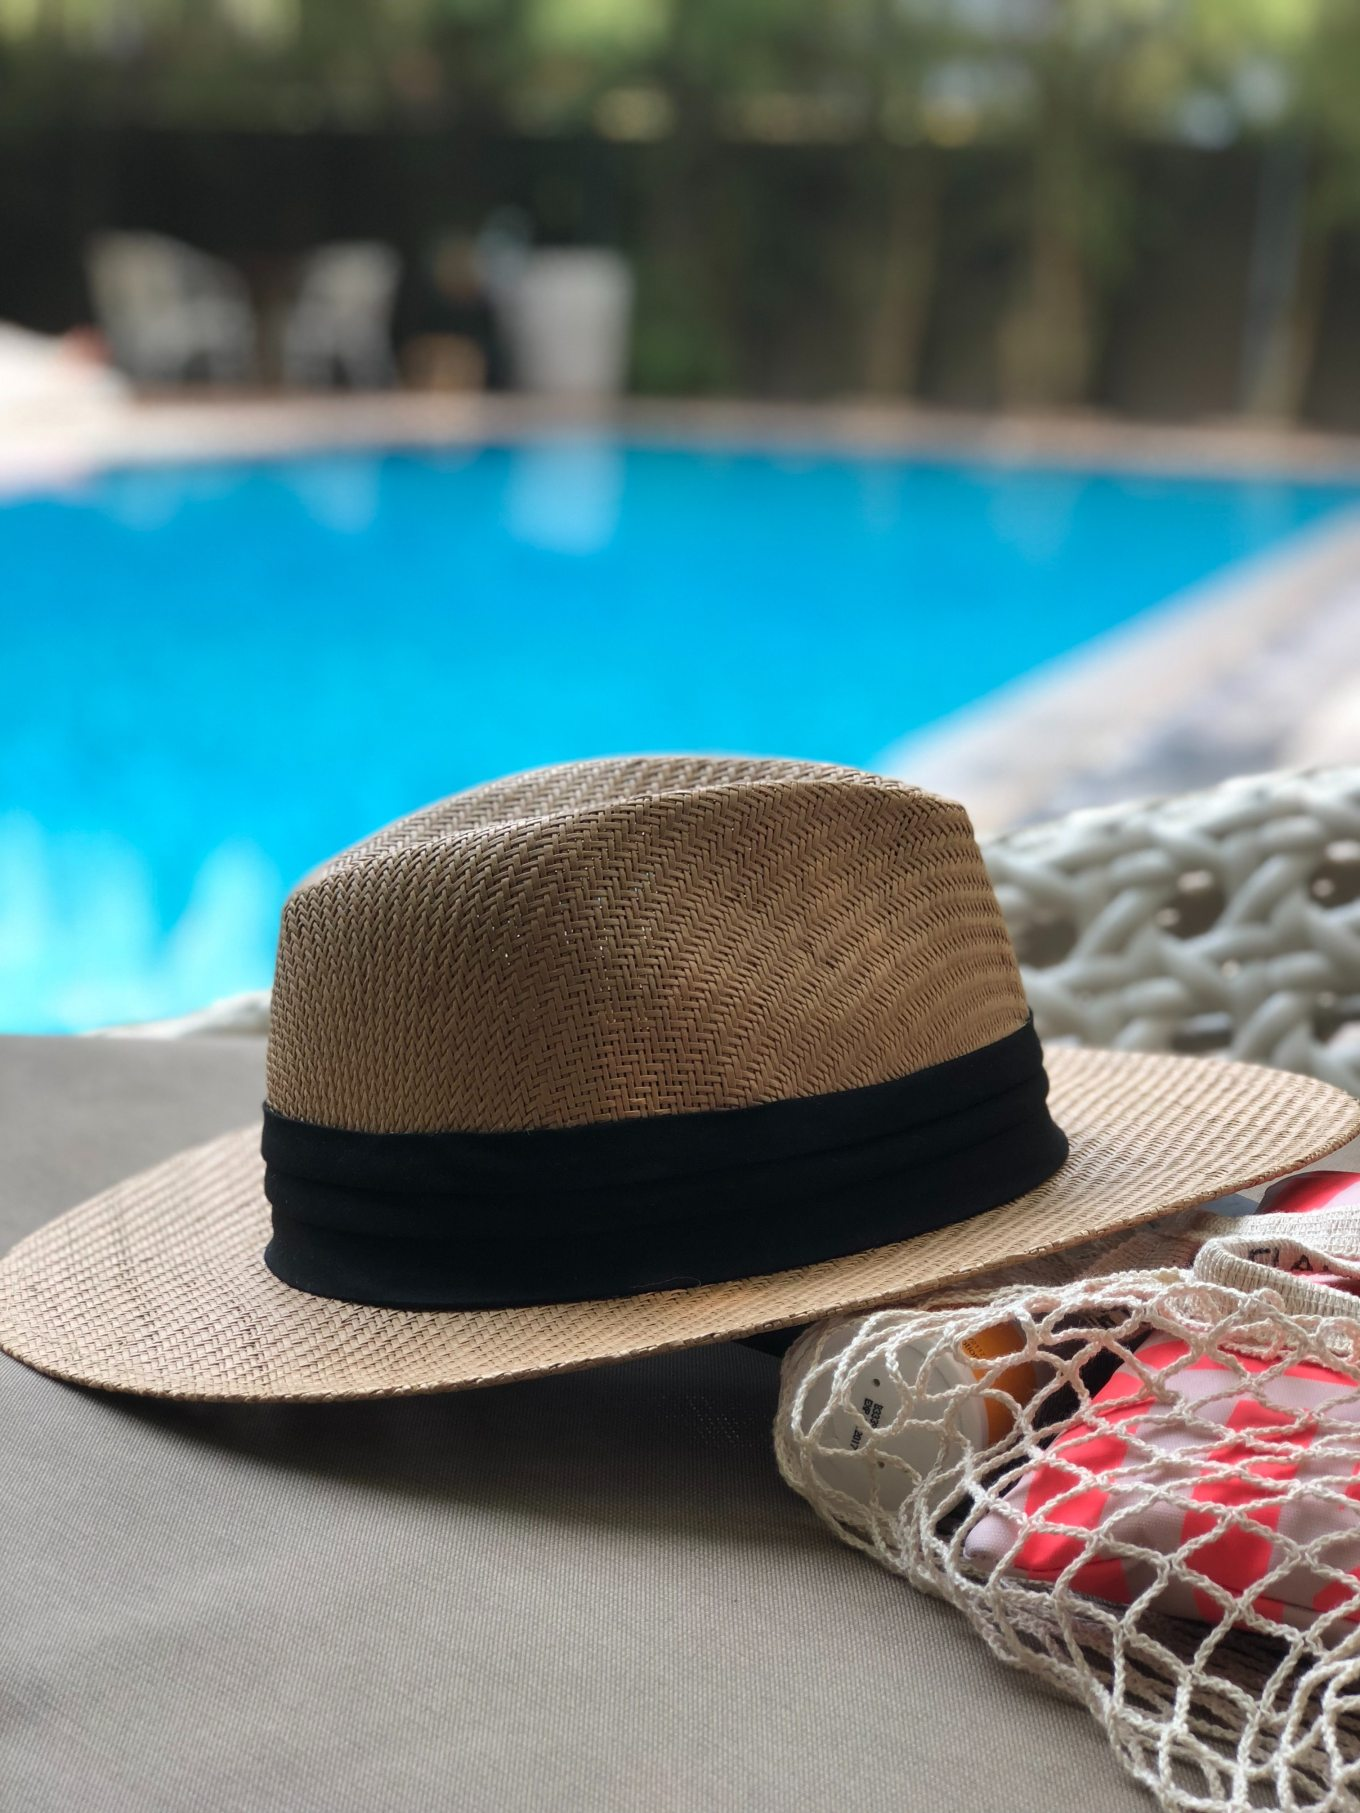 beige-and-black-hat-near-swimming-pool-984619